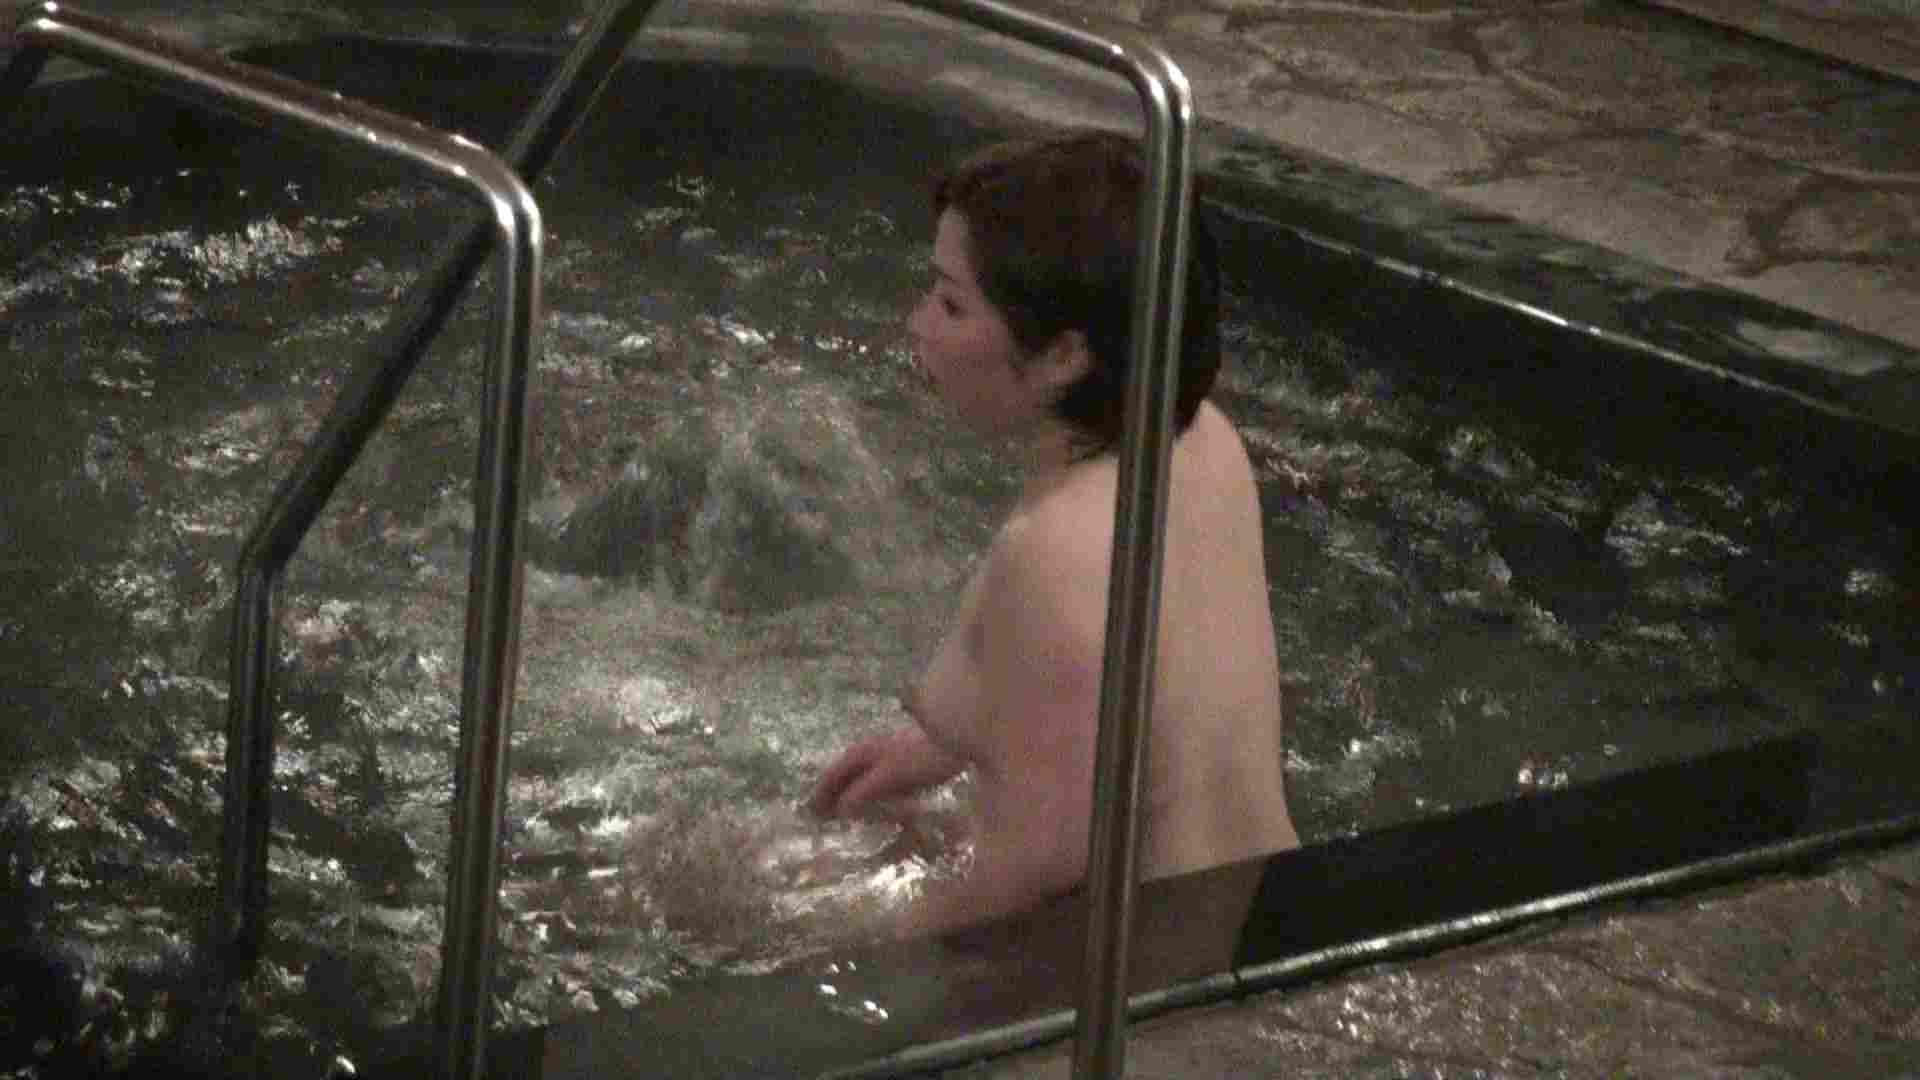 Aquaな露天風呂Vol.432 エッチな盗撮 オマンコ動画キャプチャ 111pic 78